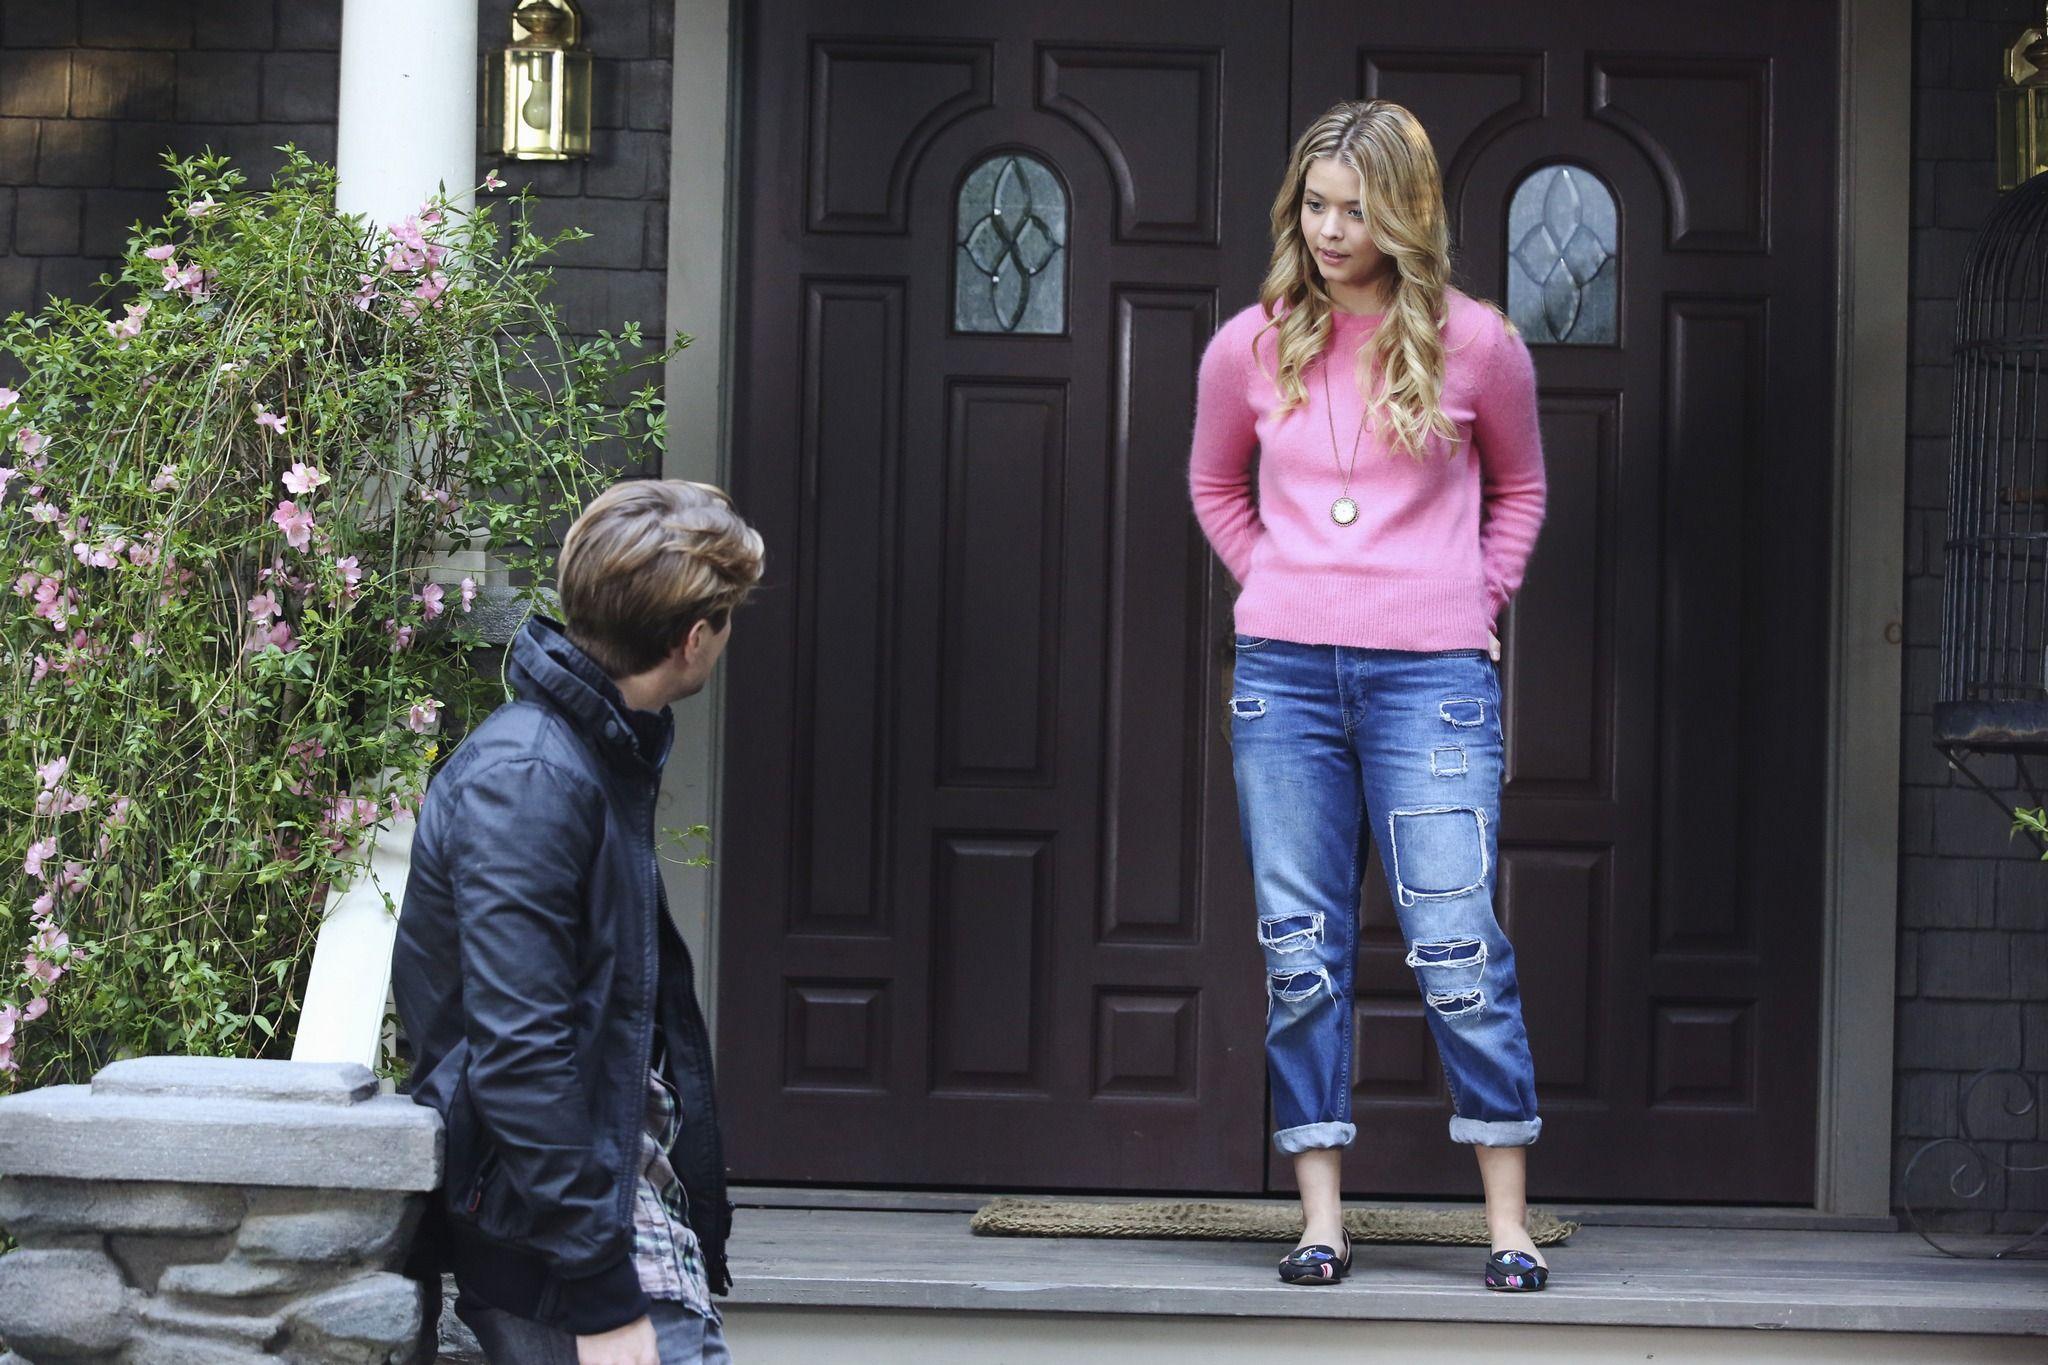 thời trang phim truyền hình pretty little liars alison dilaurentis áo len hồng quần jeans